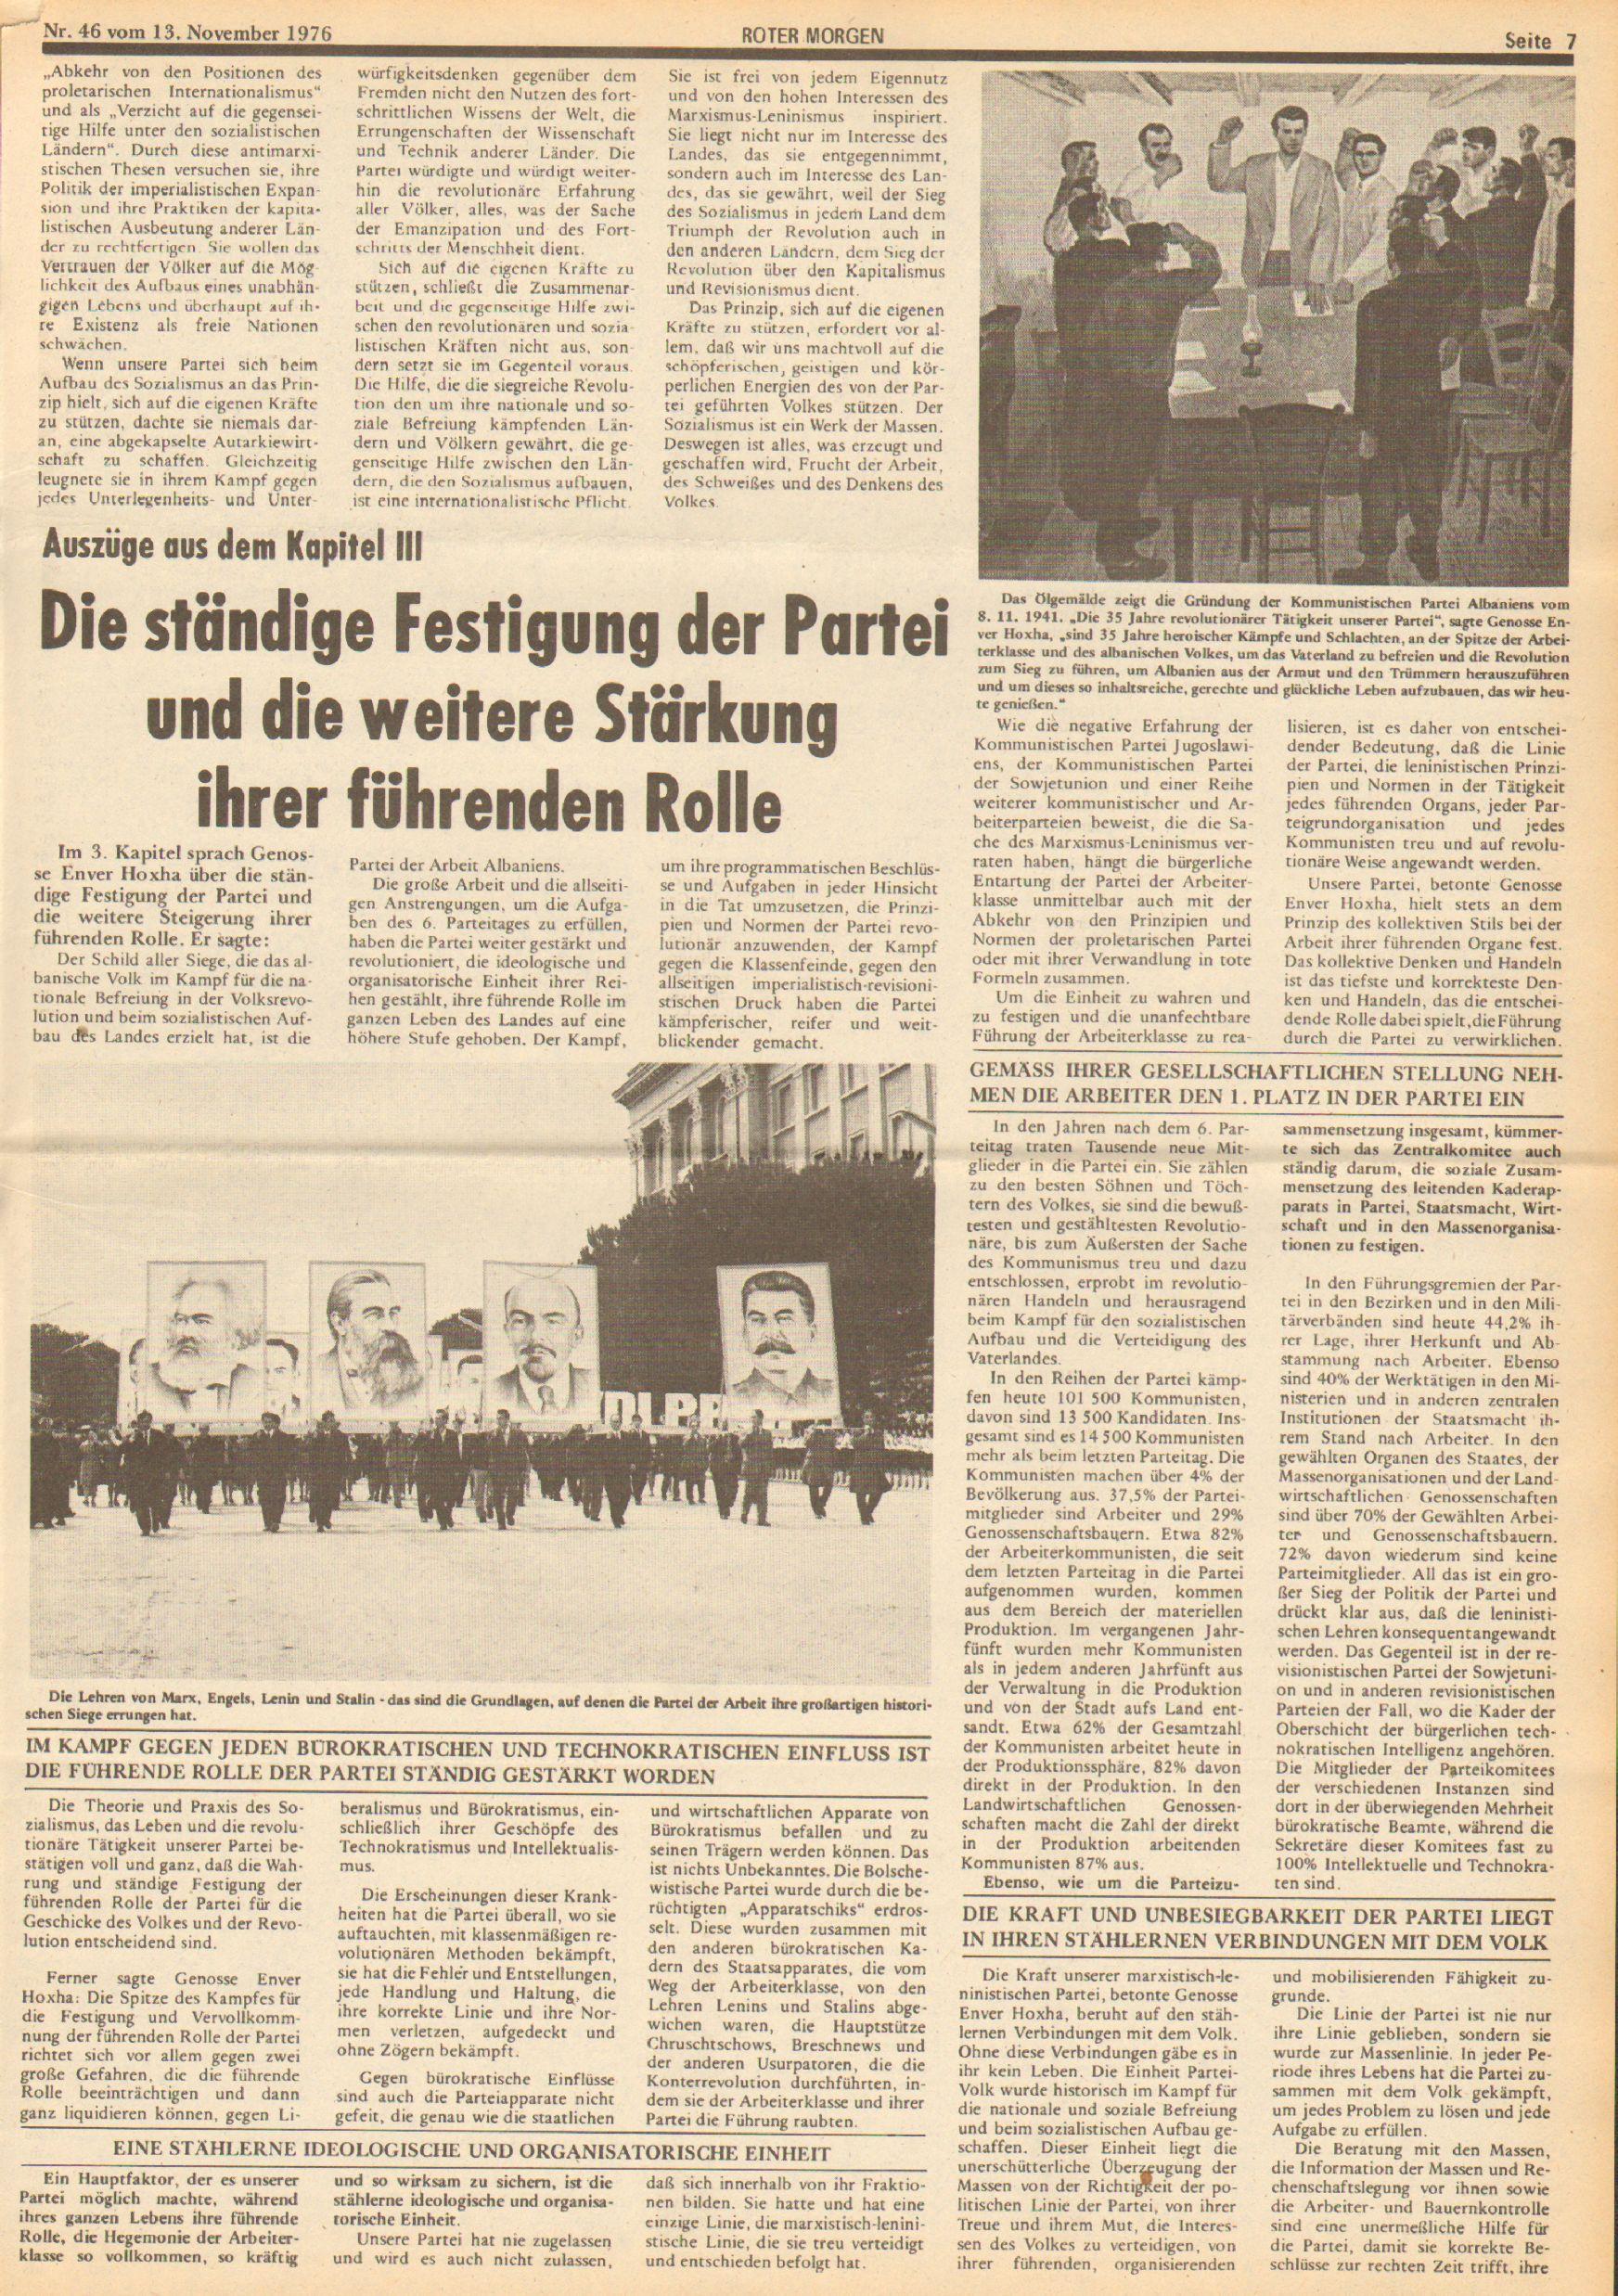 Roter Morgen, 10. Jg., 13. November 1976, Nr. 46, Seite 7